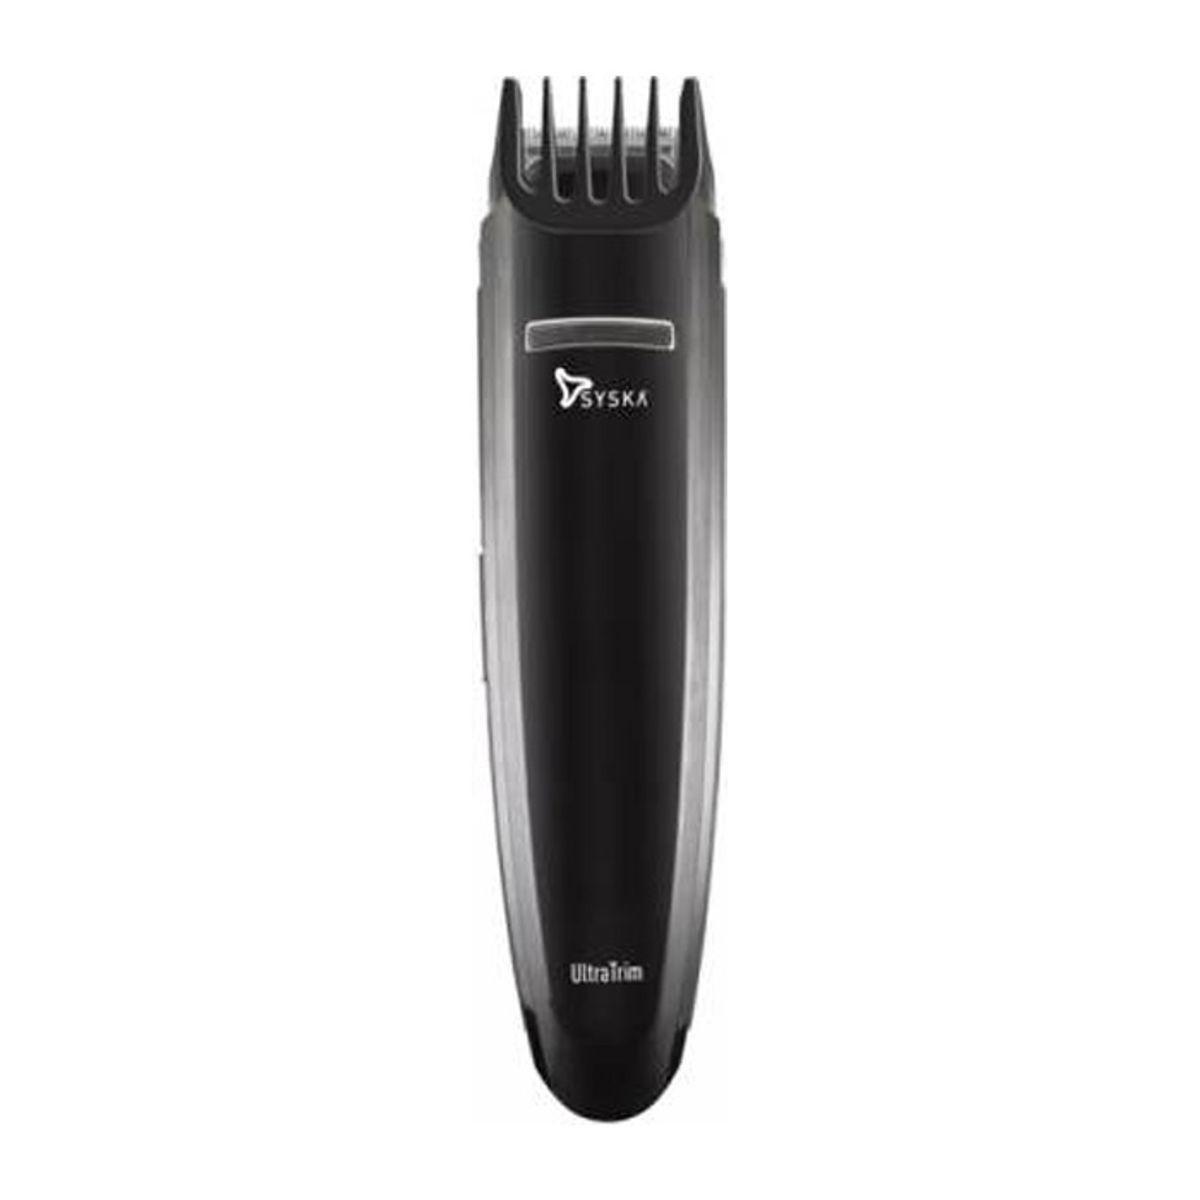 SYSKA HT200 Ultra Trim Beard Trimmer